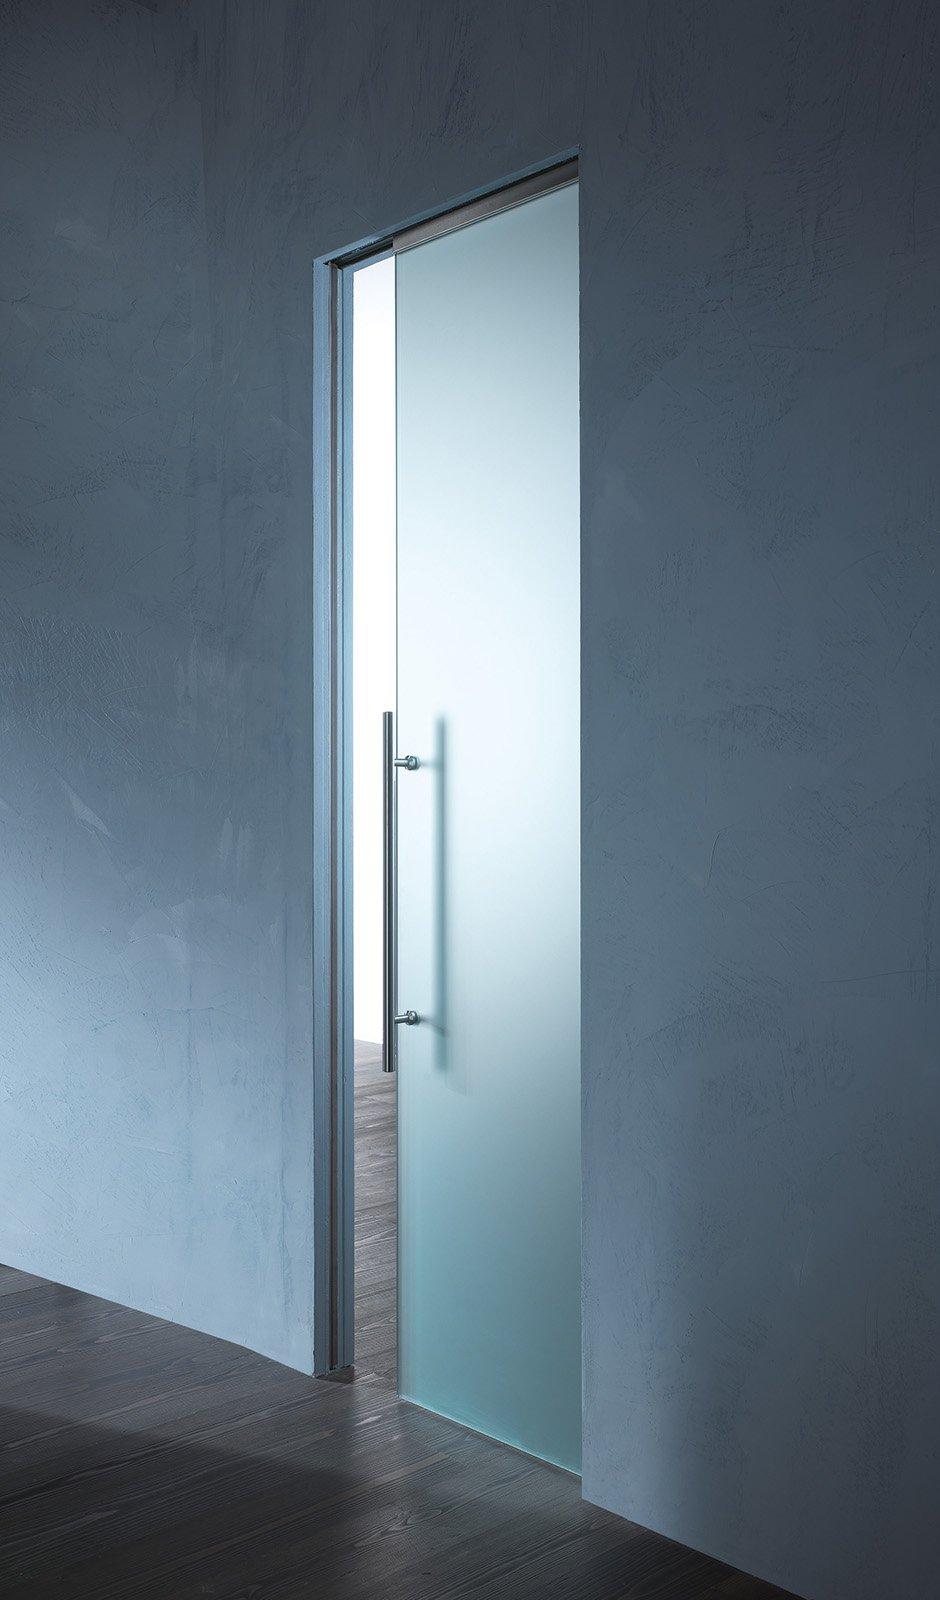 Porte Vetro Scorrevoli : Porte scorrevoli in vetro a scomparsa o esterno muro